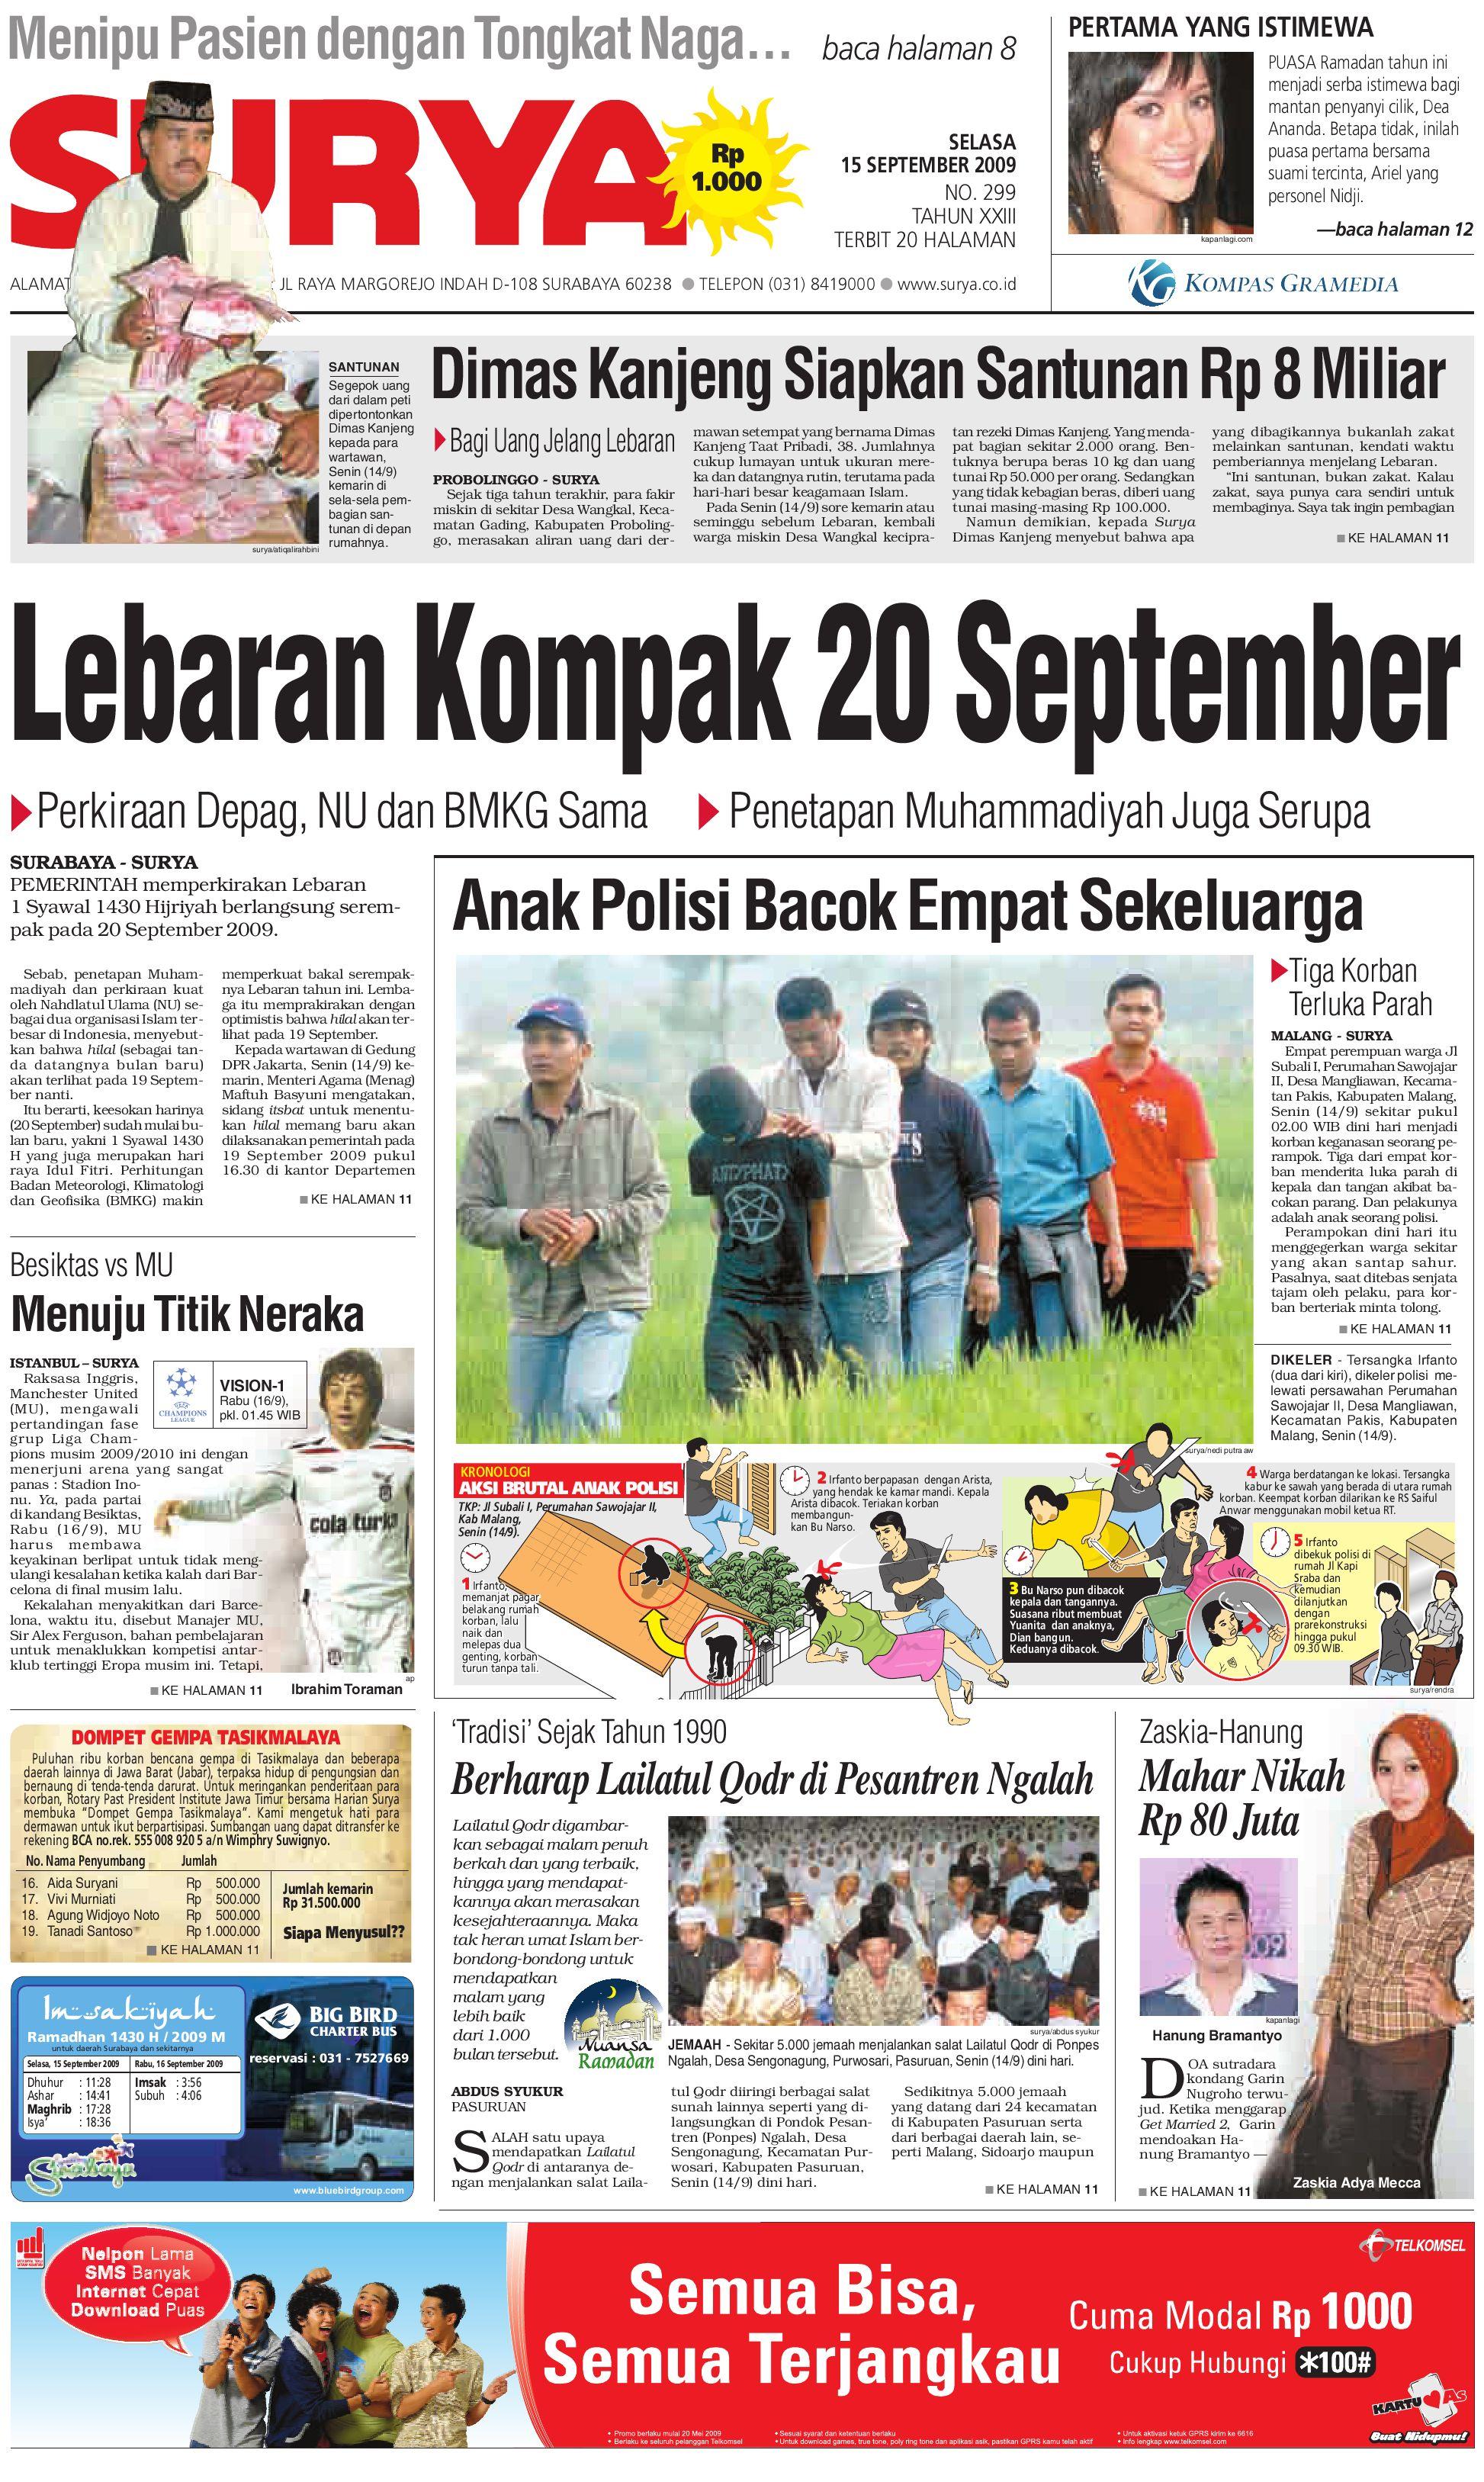 Surya Edisi Cetak 15 Sept 2009 By Harian Issuu Rejeki Anak Soleh 3 Voucher Carrefour Rp 200000